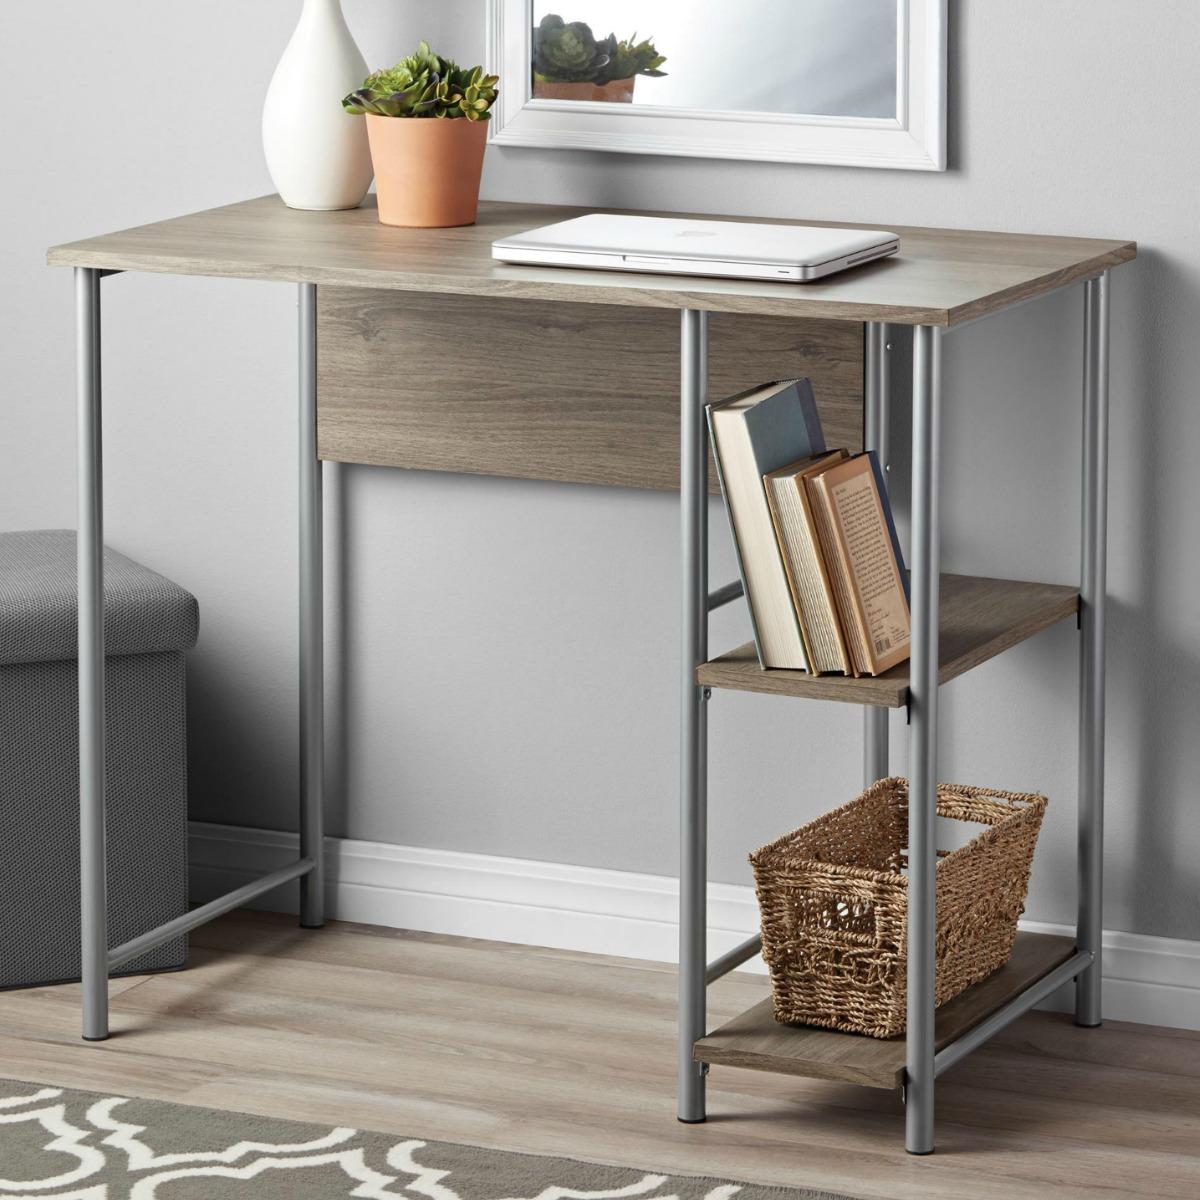 Mainstays Basic Student Desk Only 29 At Walmart Regularly 50 Hip2save